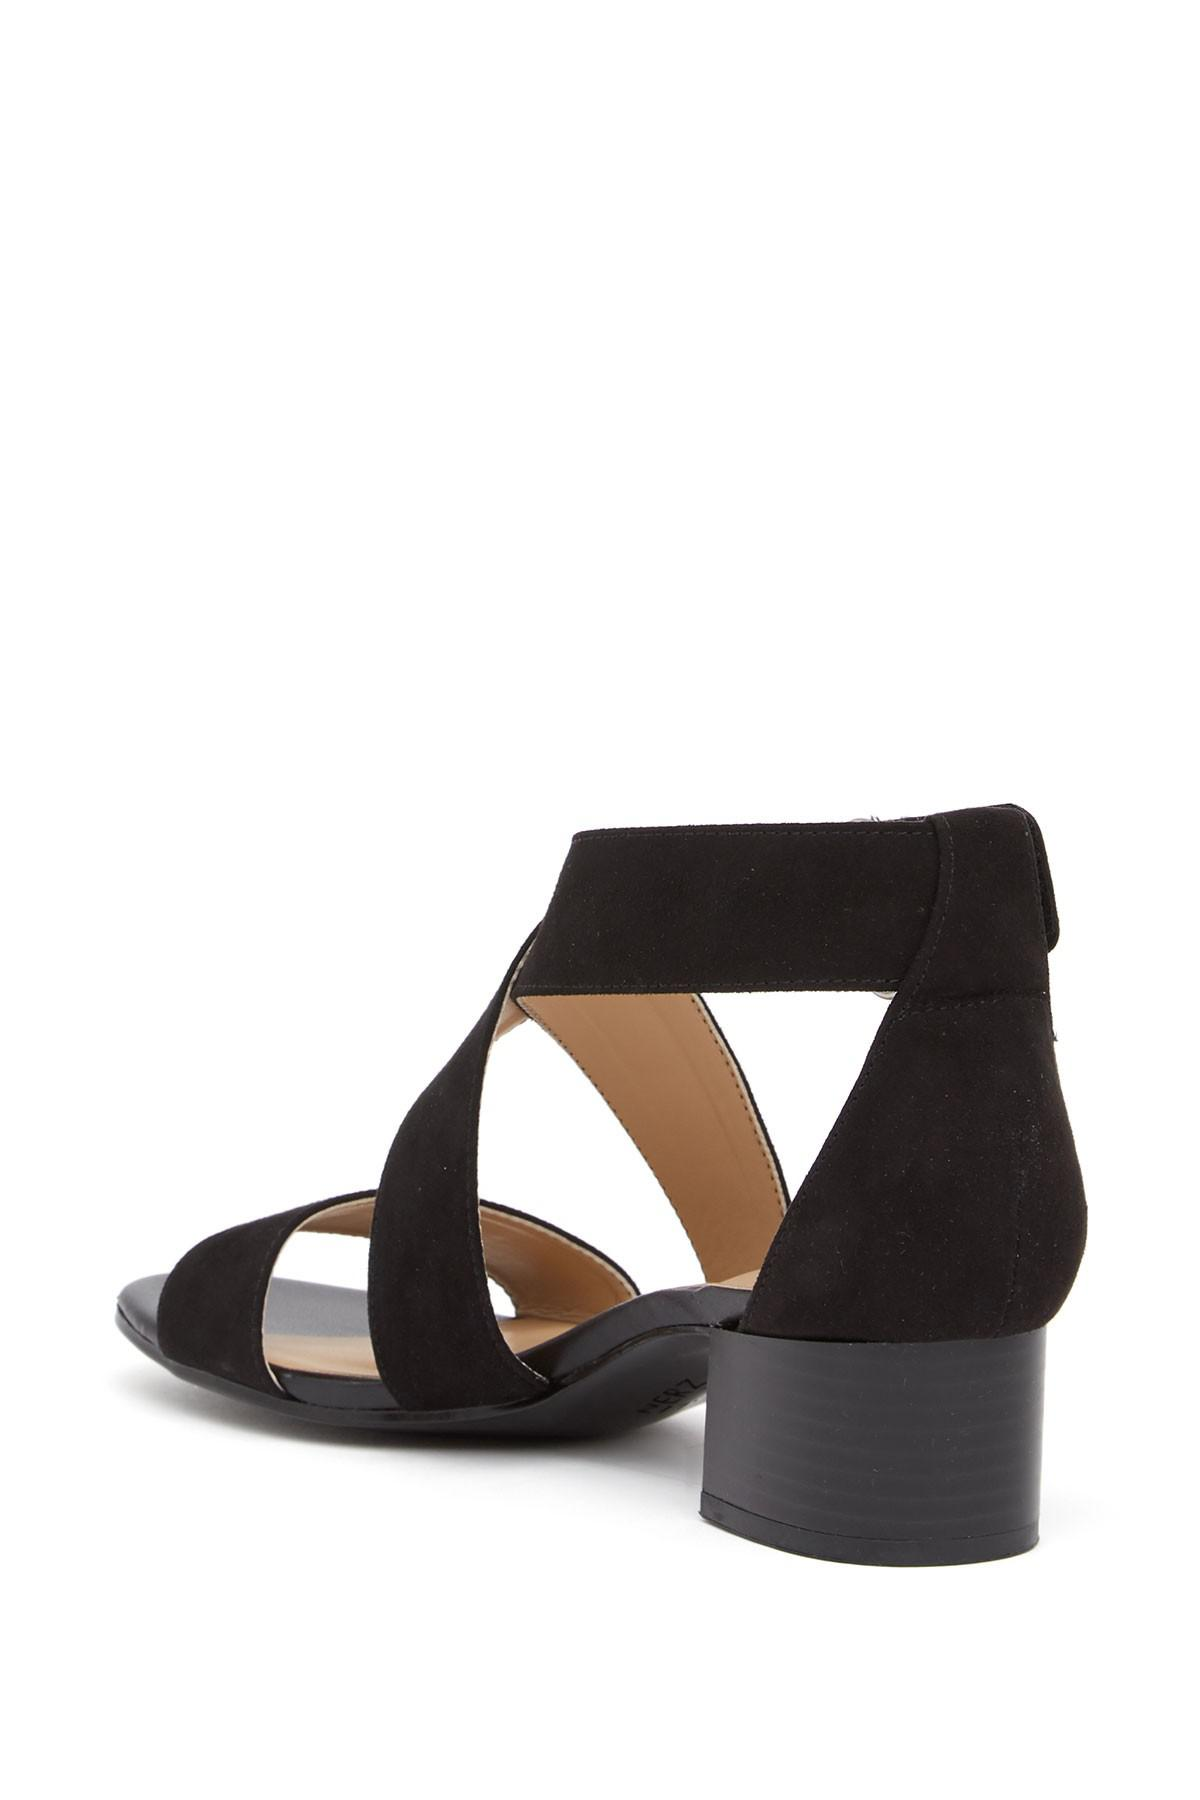 9c10c6a8e33 Naturalizer - Black Adele Block Heel Sandal - Wide Width Available - Lyst.  View fullscreen